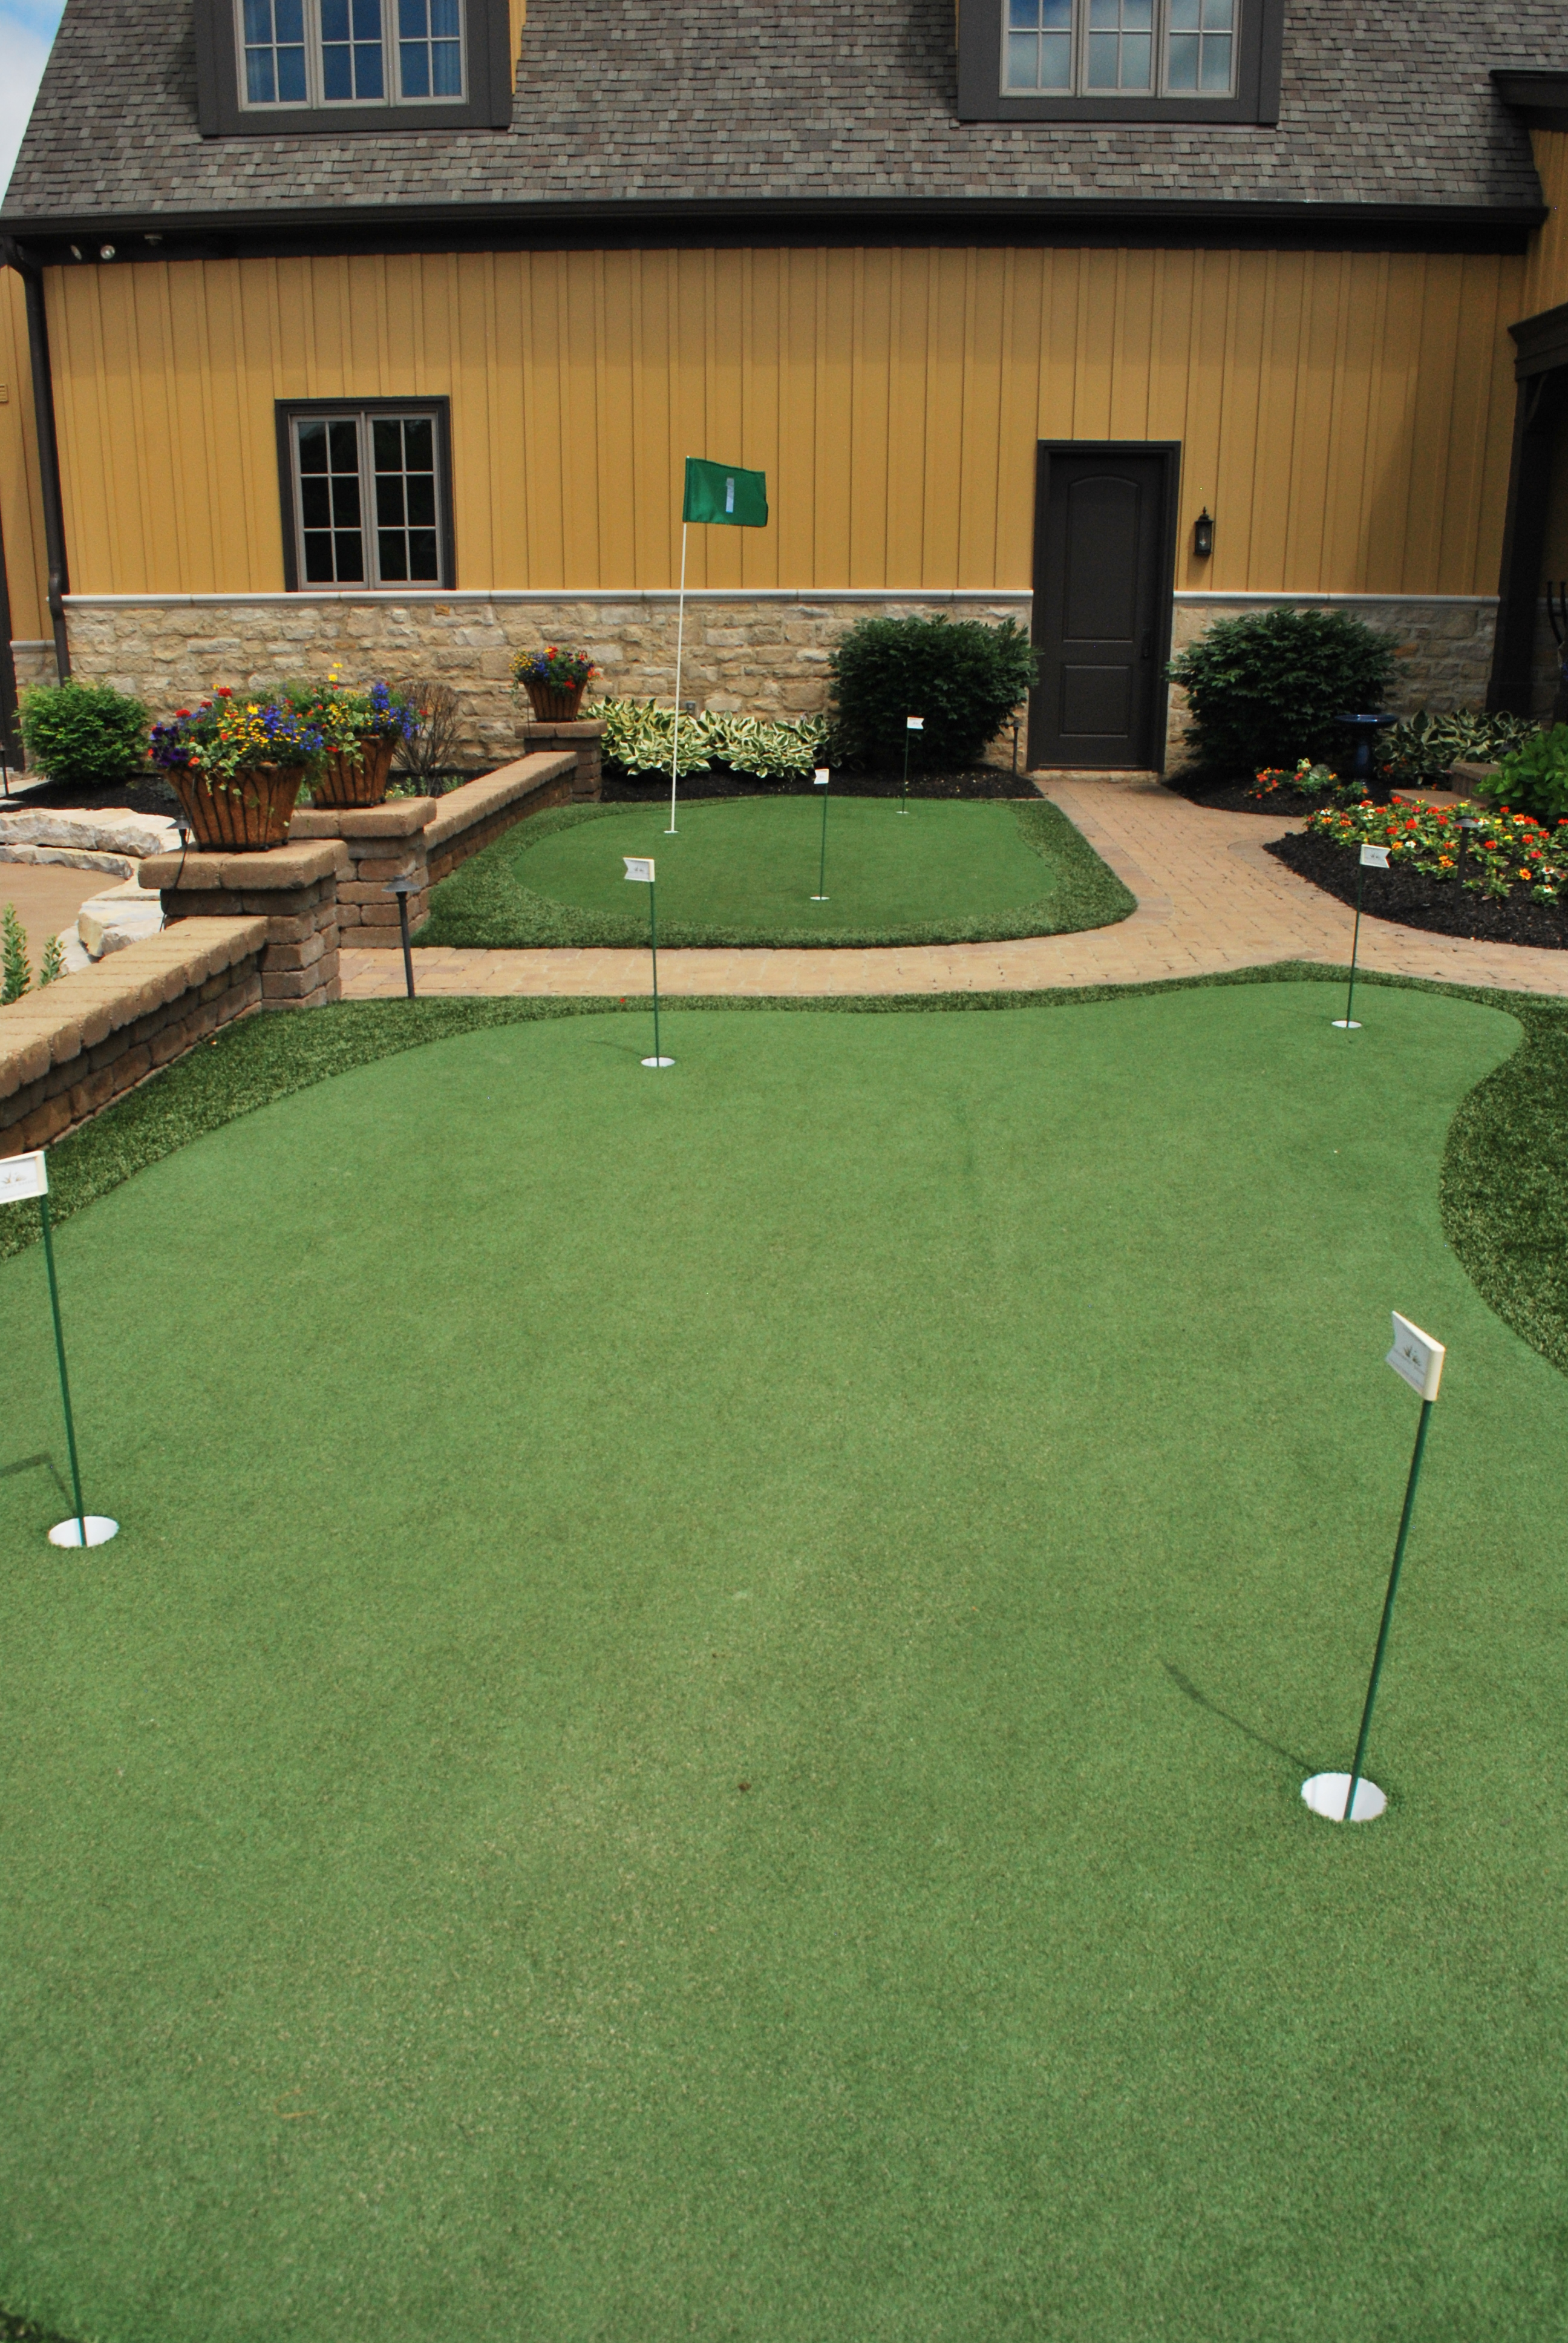 birmingham al putting greens u0026 artificial grass turf for golf